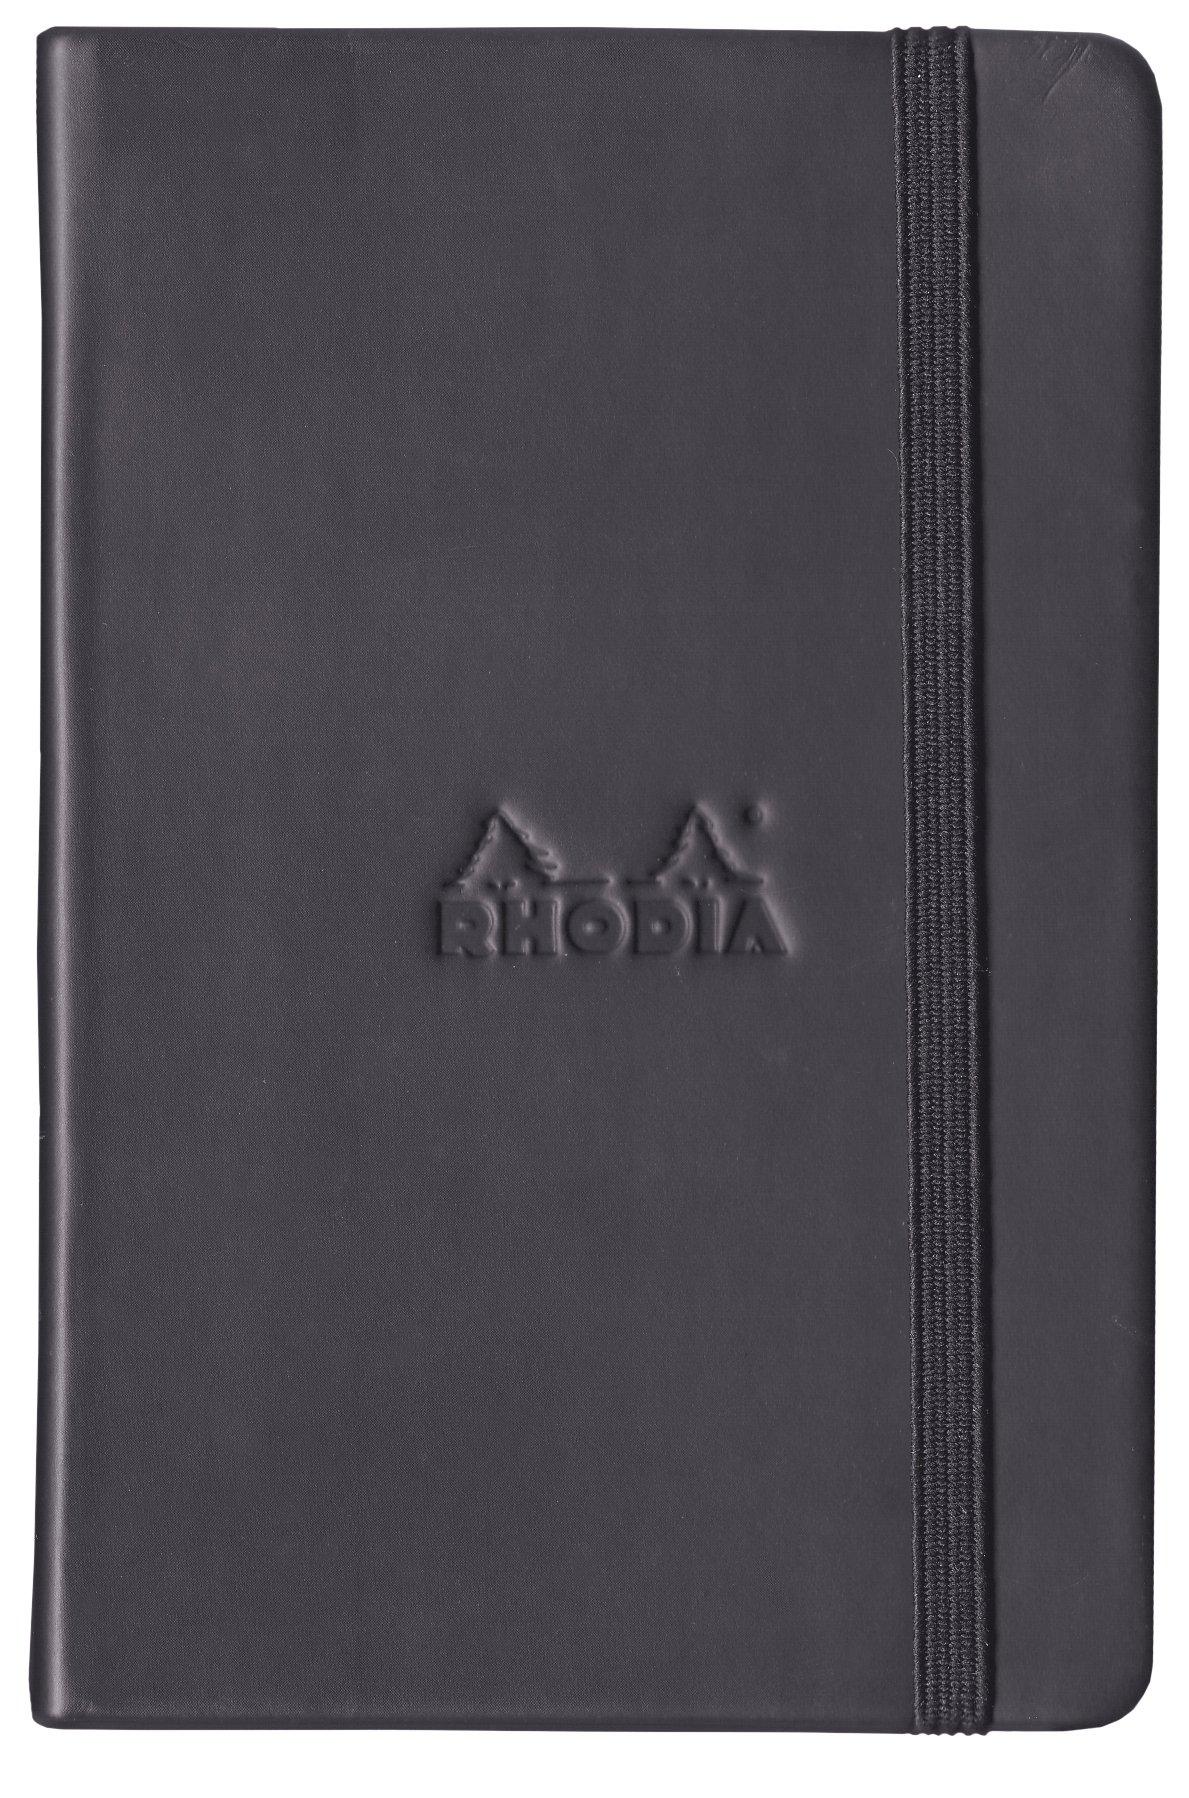 Rhodia Black Webnotebook, Dot Grid, 5.5X8.25 Inch by Rhodia